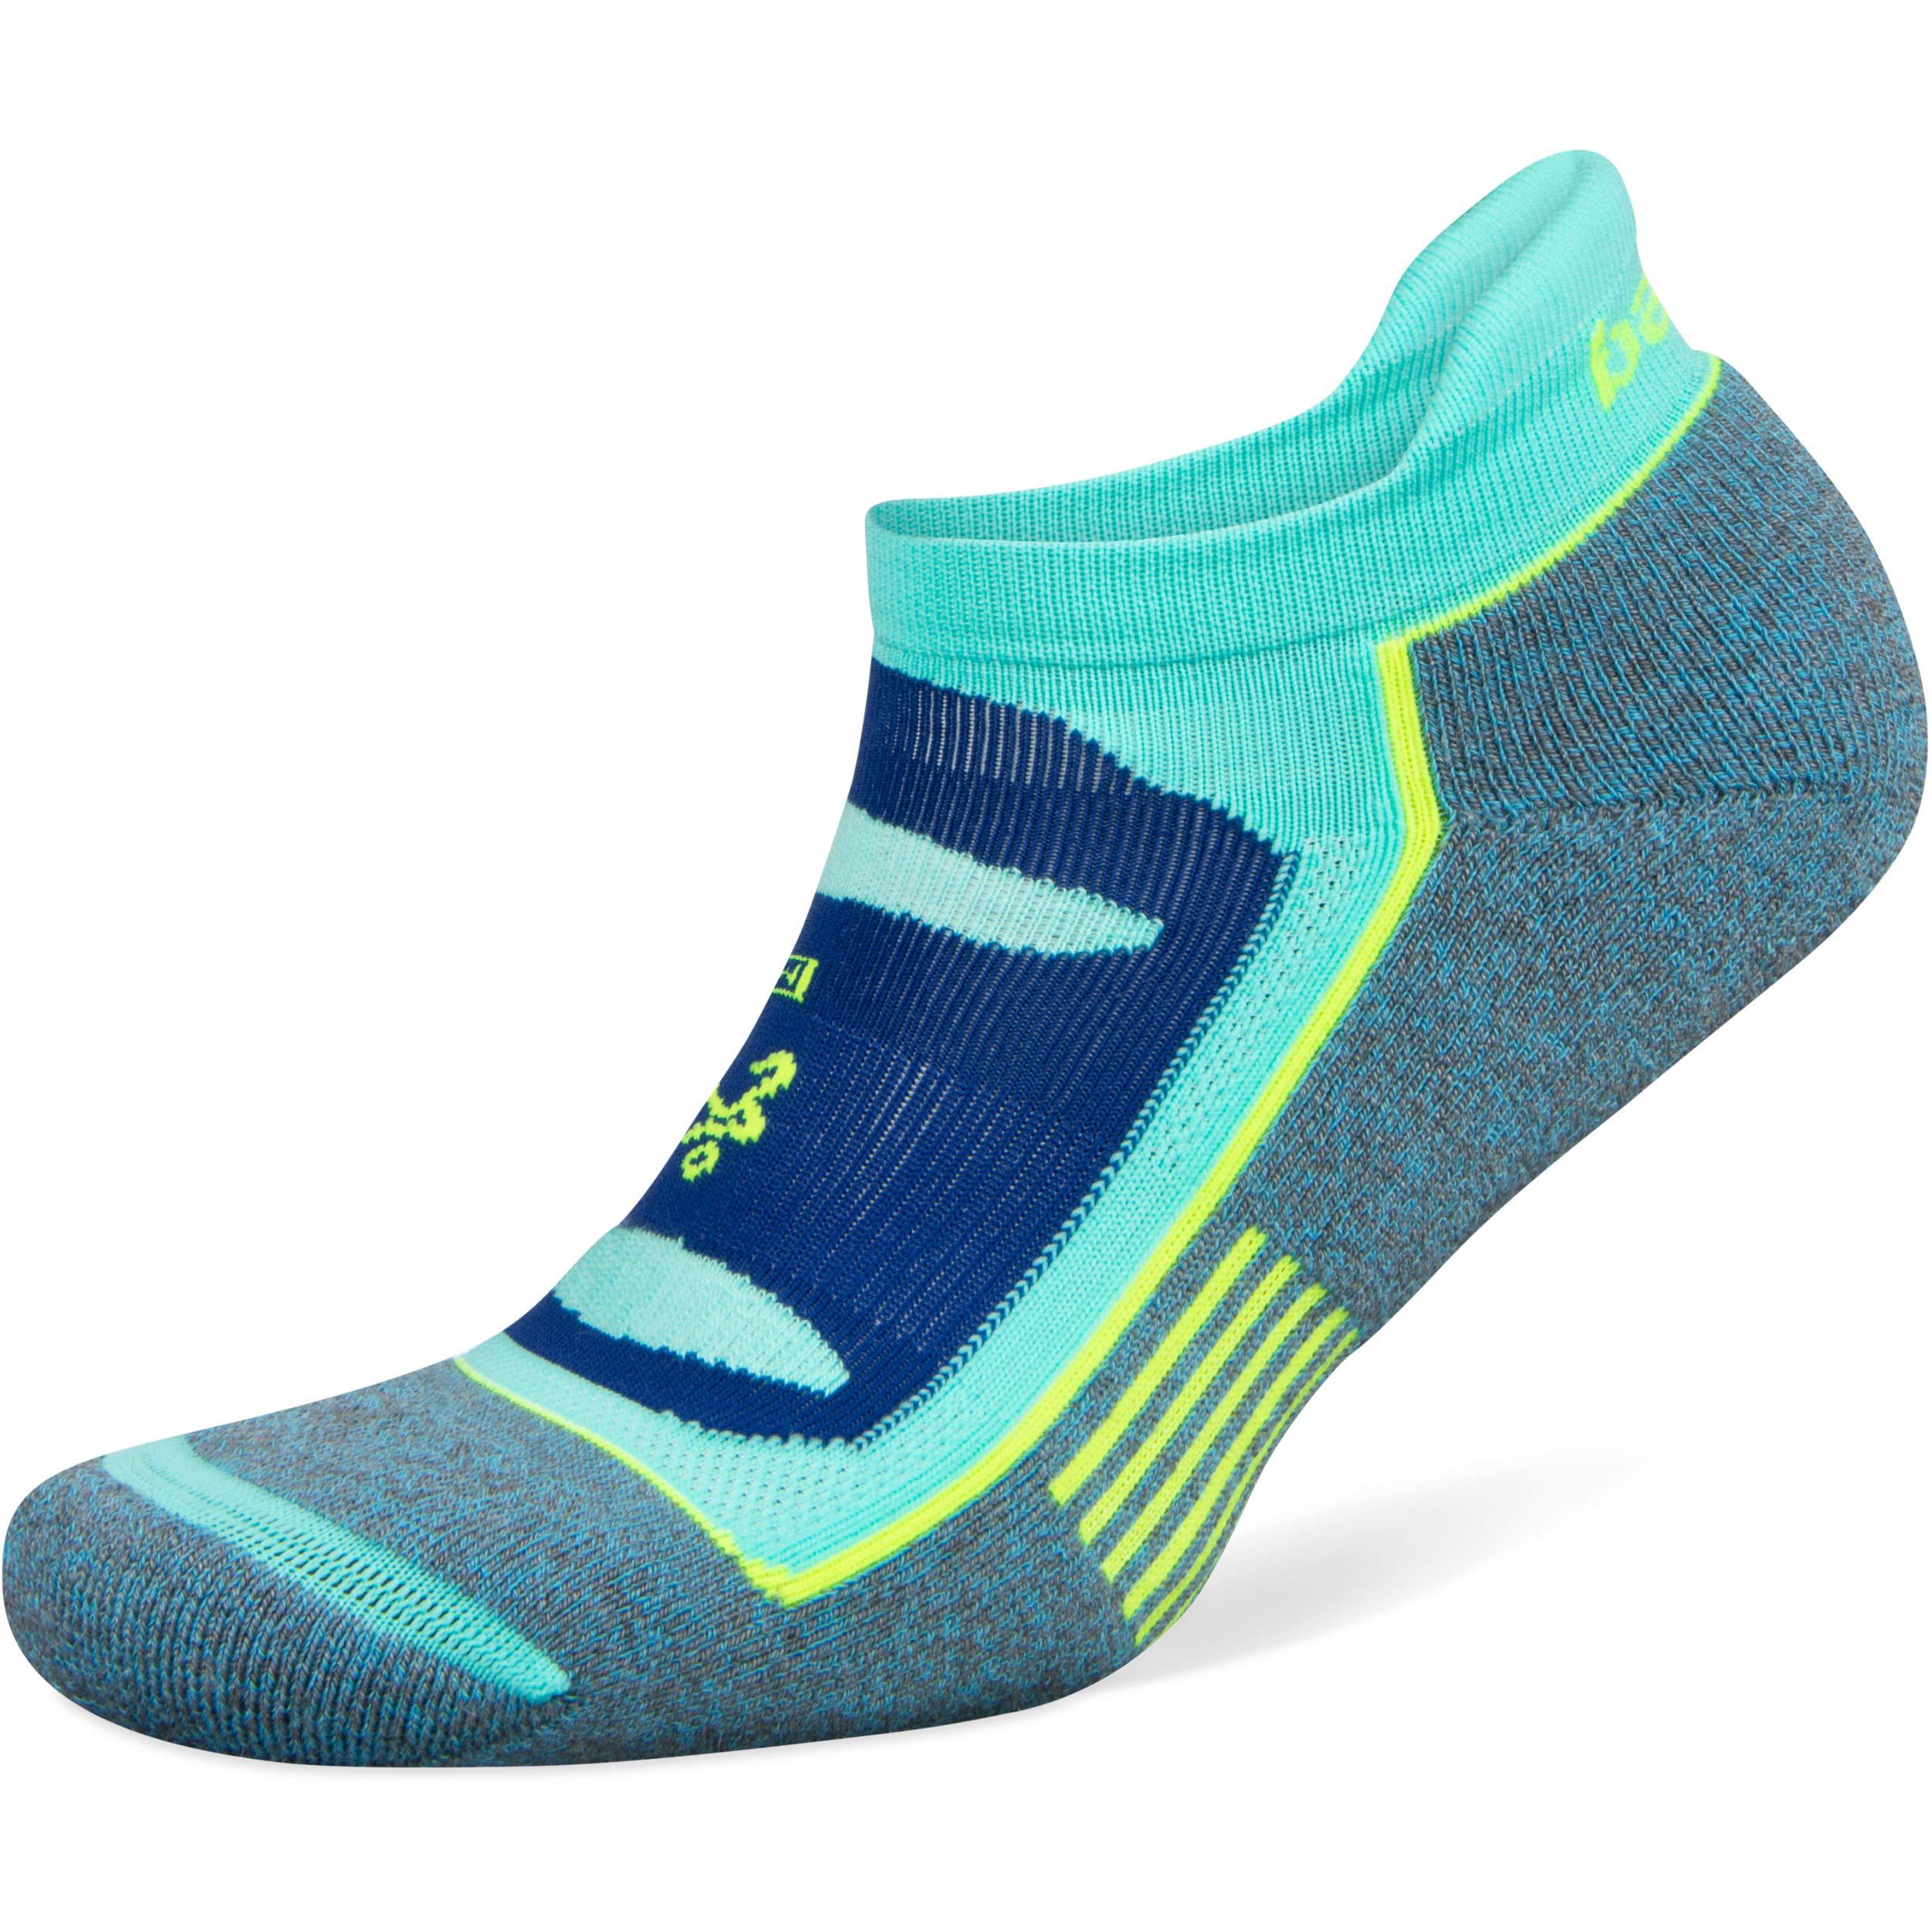 Balega Blister Resist No Show Socks for Men and Women (1 Pair), Ethereal Blue/Light Aqua, Small by Balega